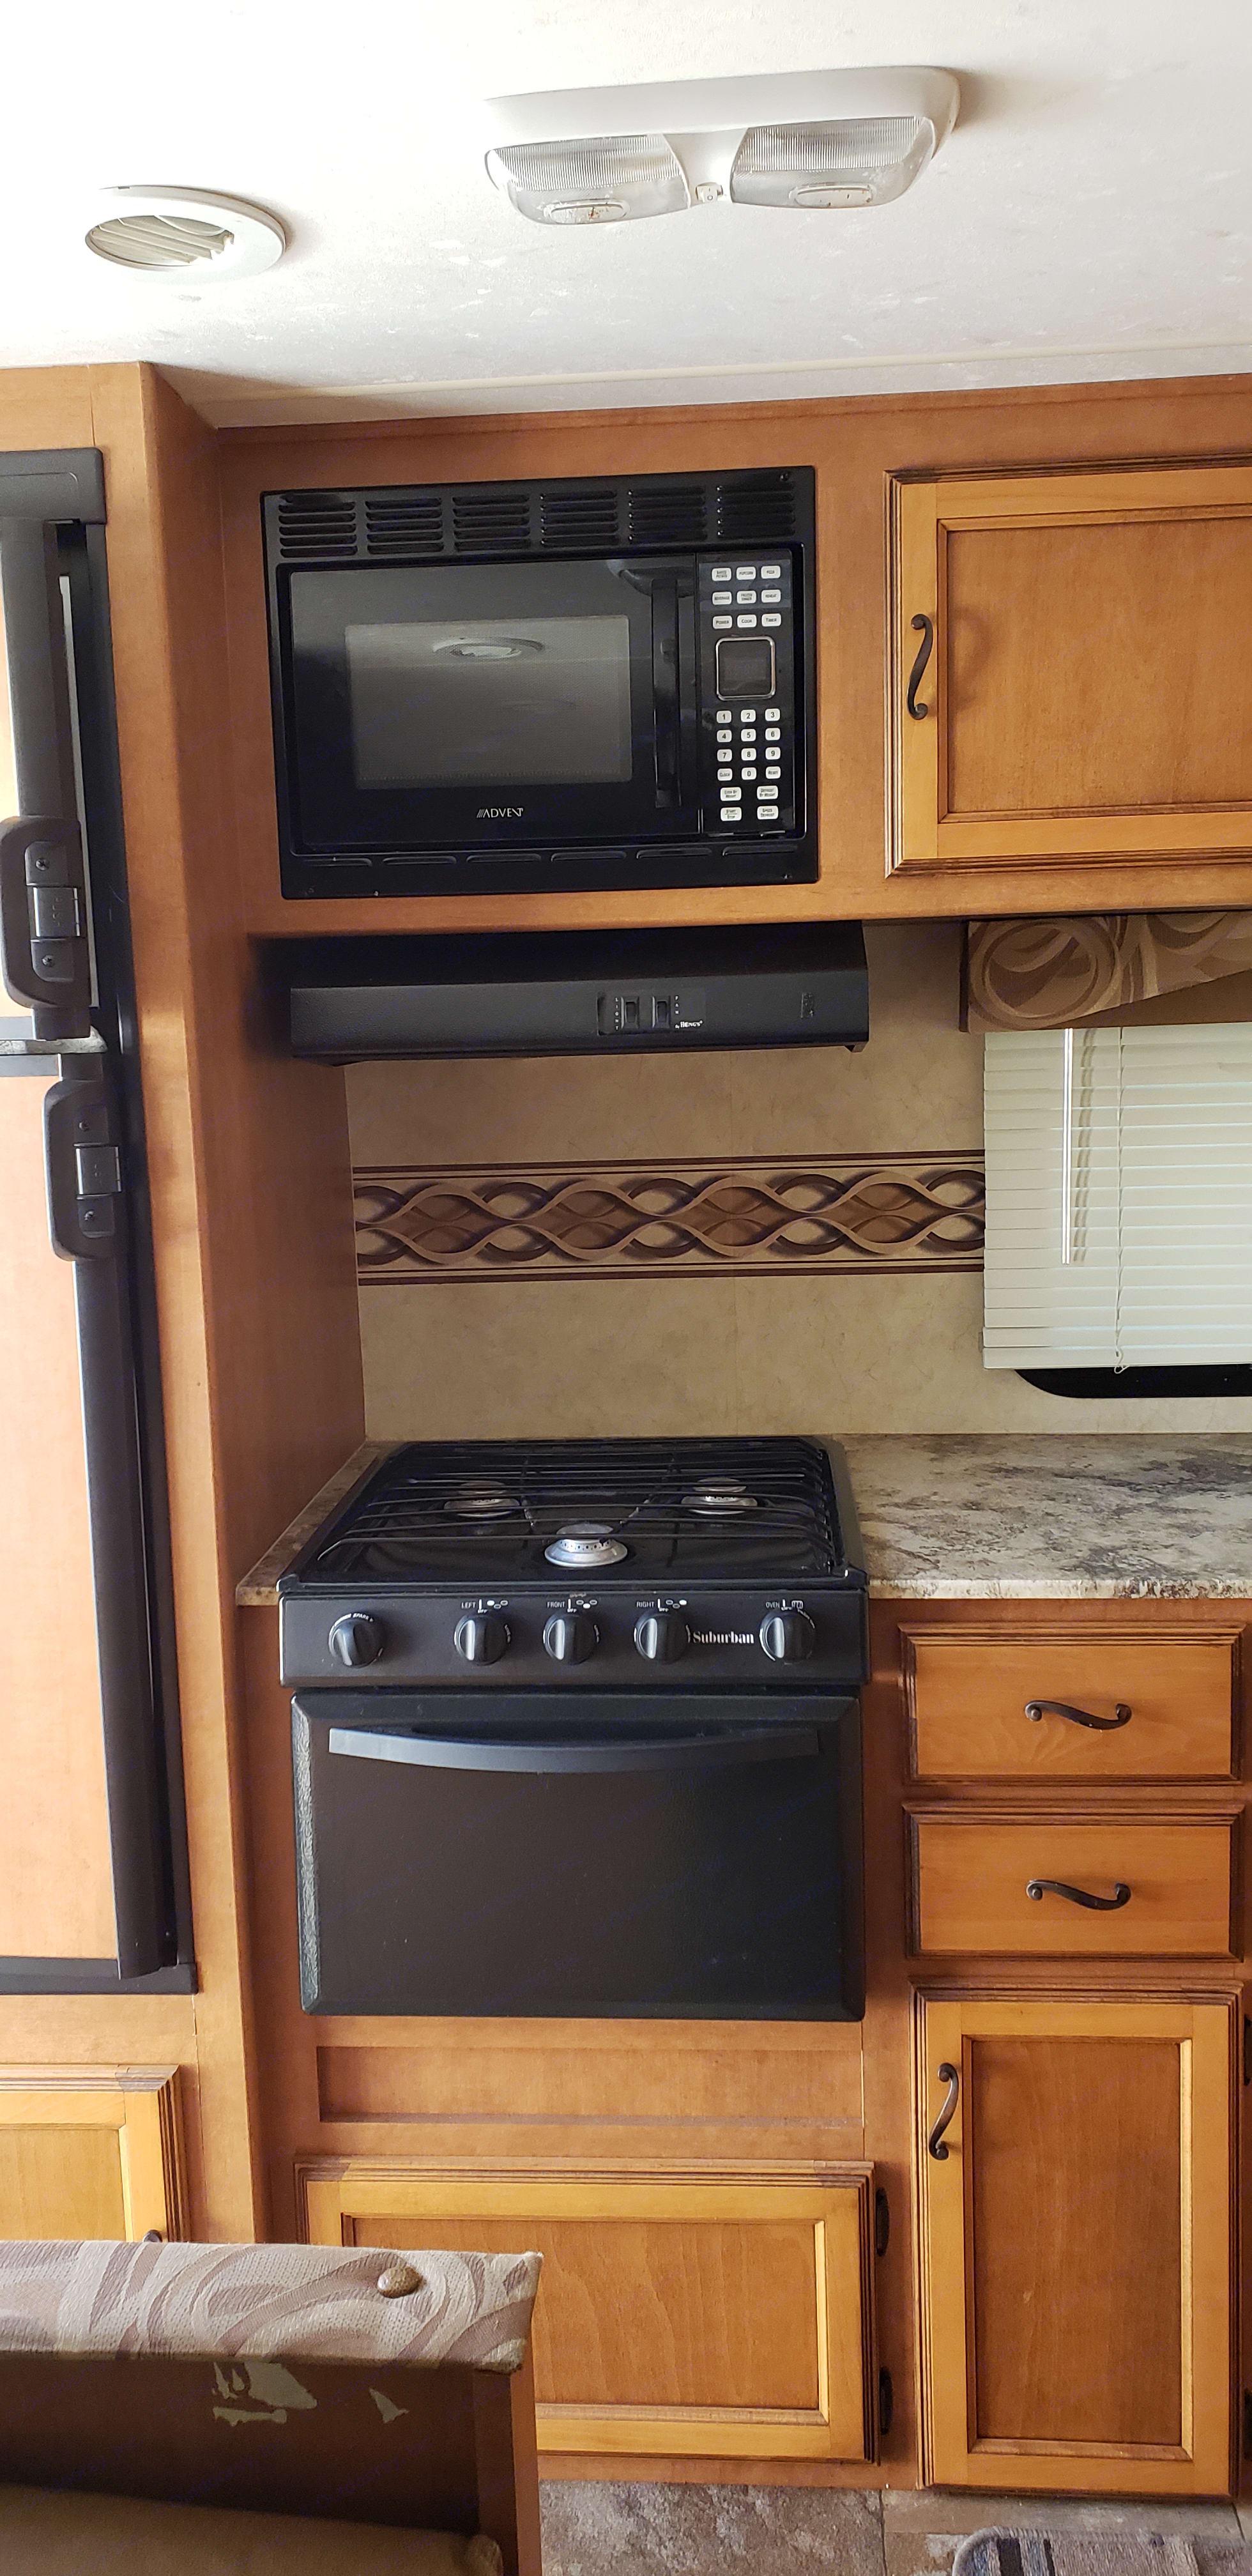 Kitchen that includes stove, microwave,  and fridge. Coachmen Apex 2013